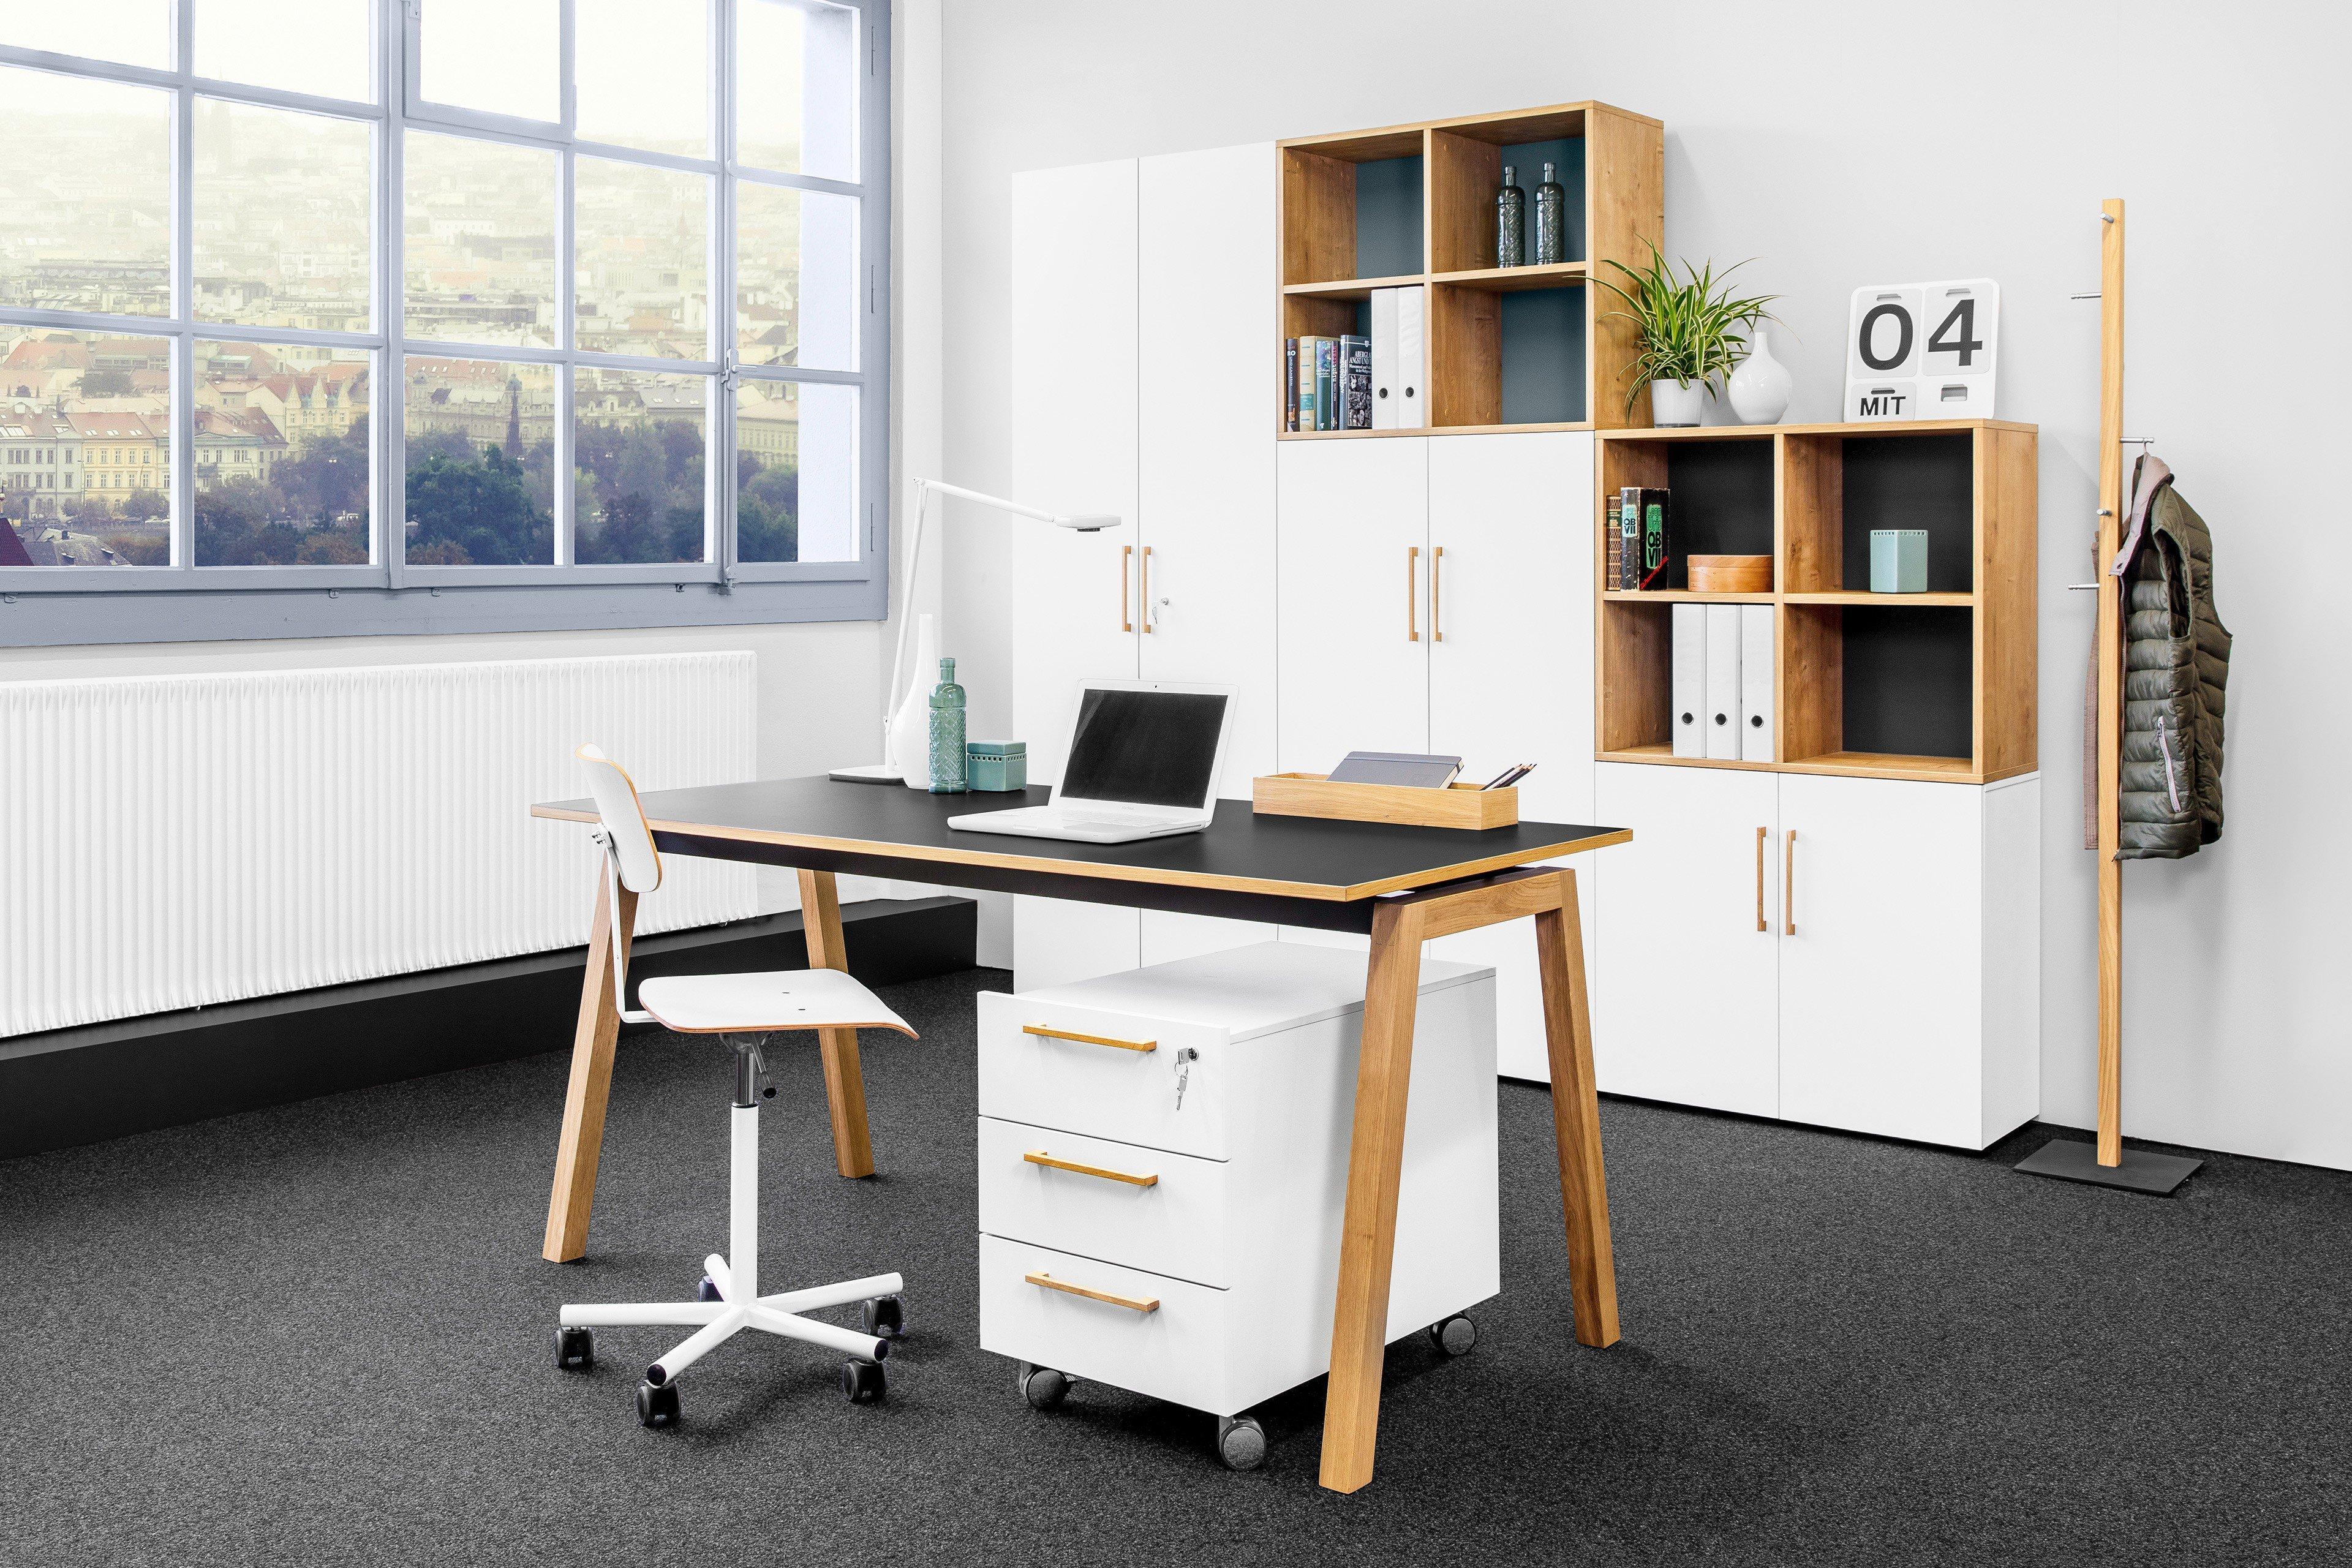 reinhard artiq b rom bel set m bel letz ihr online shop. Black Bedroom Furniture Sets. Home Design Ideas